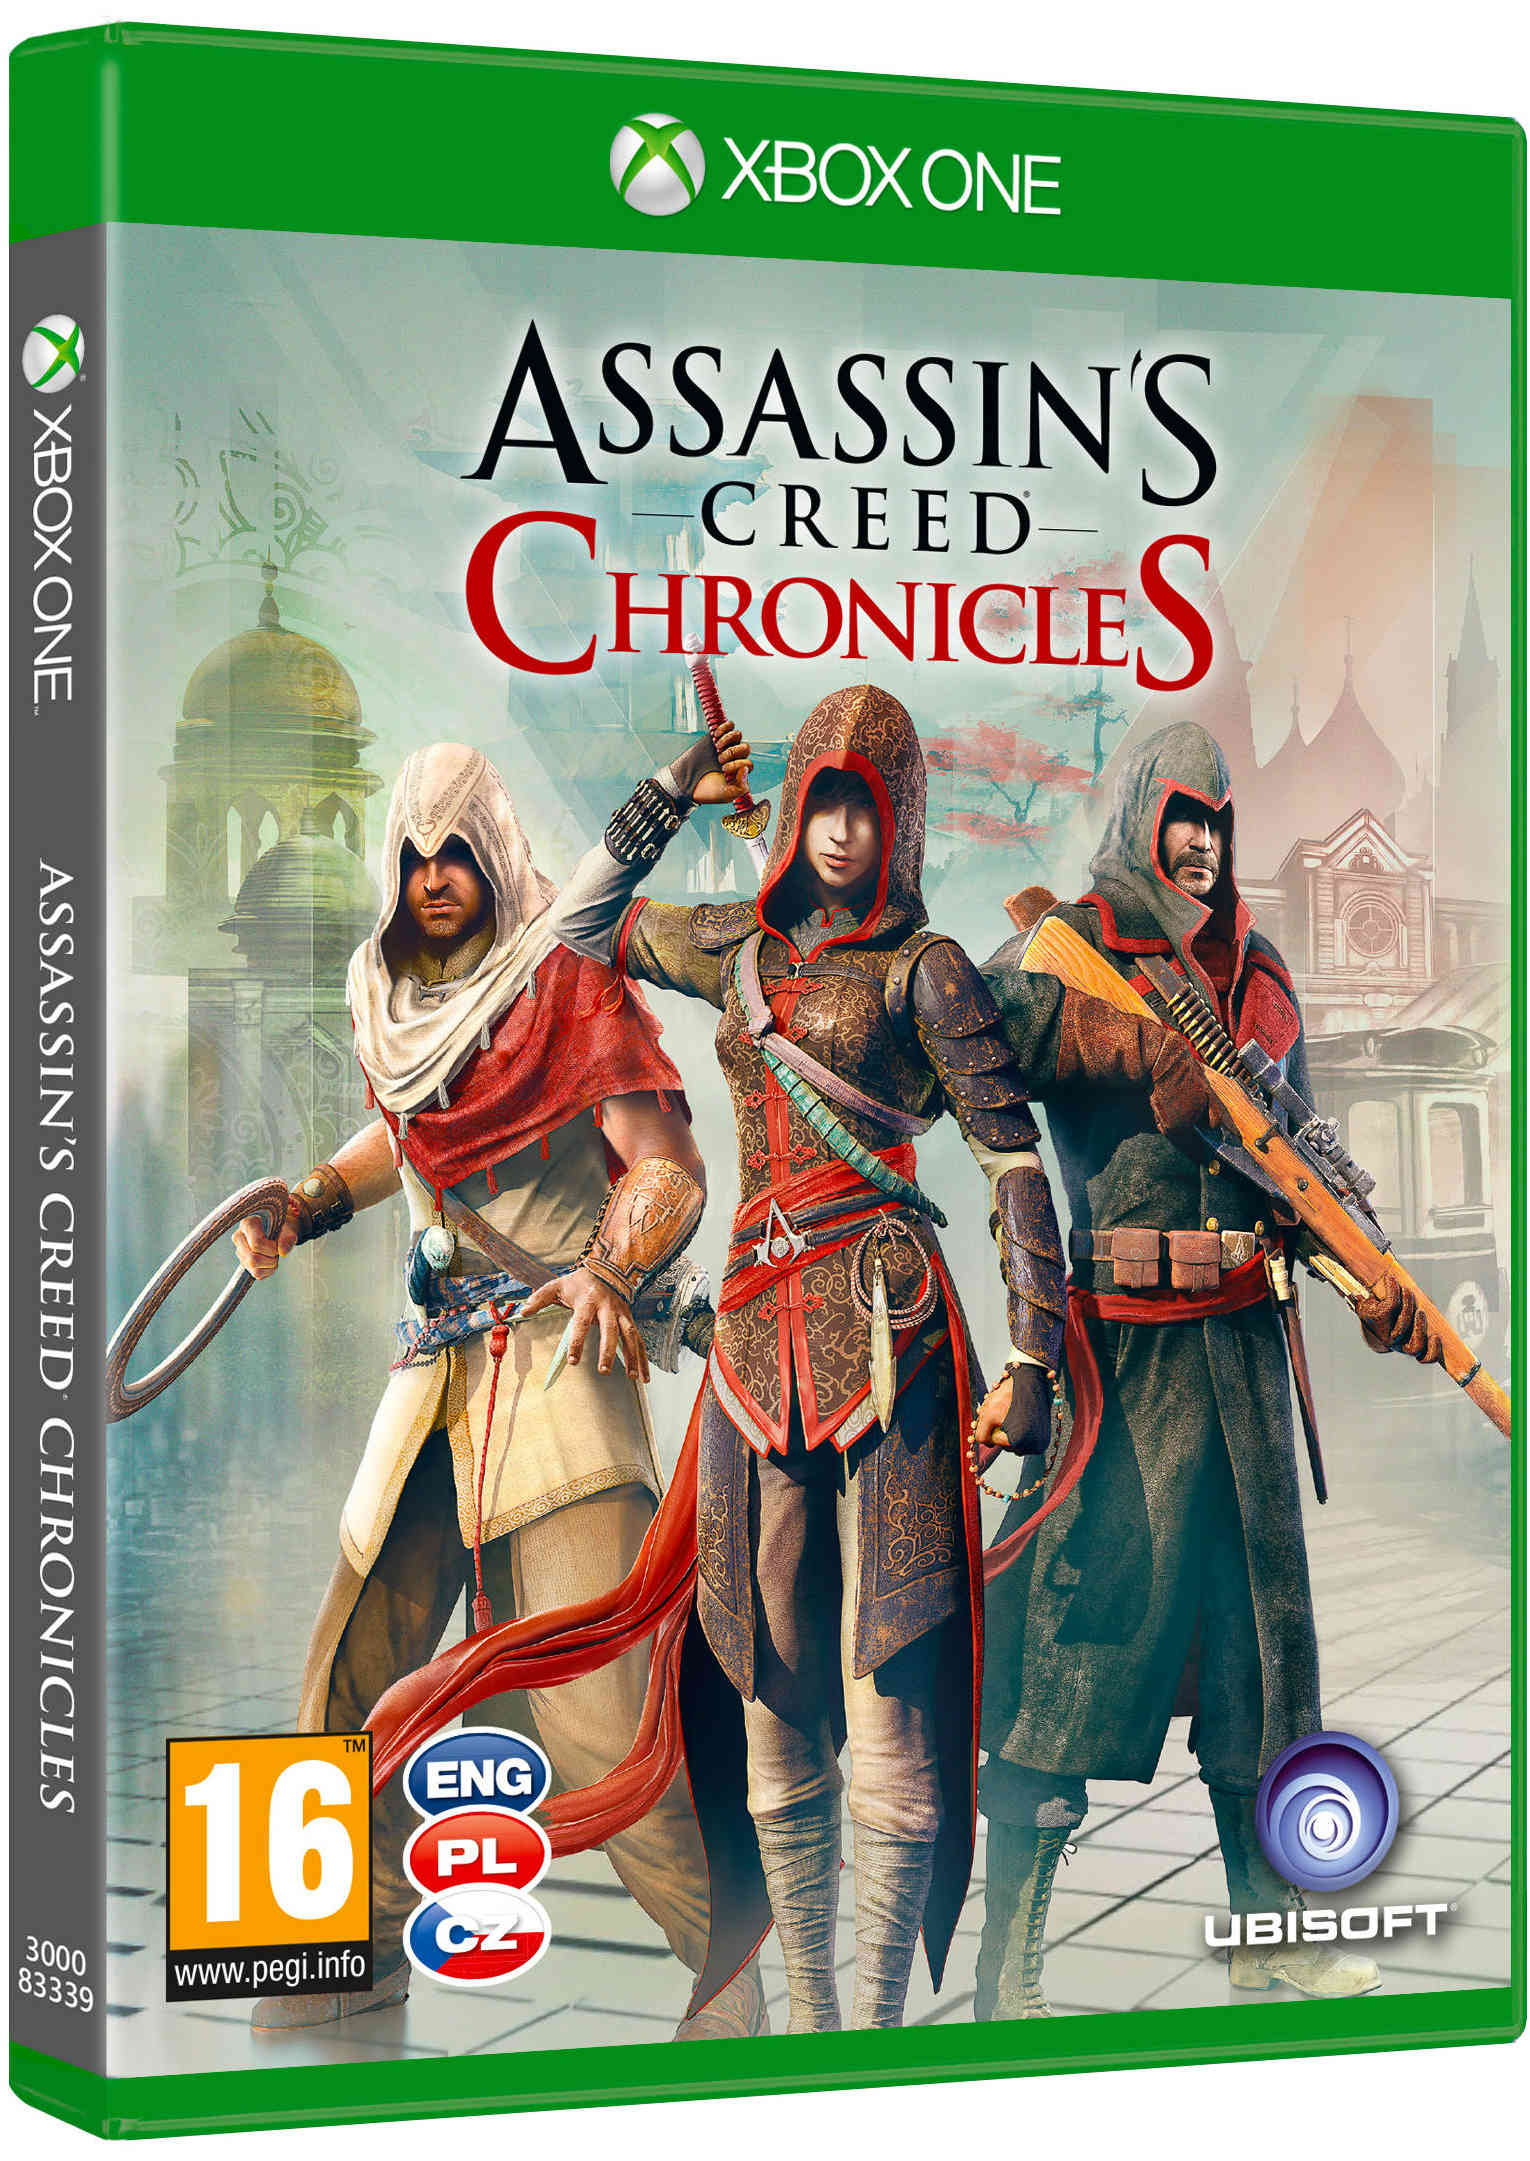 XONE - Assassins Creed Chronicles;